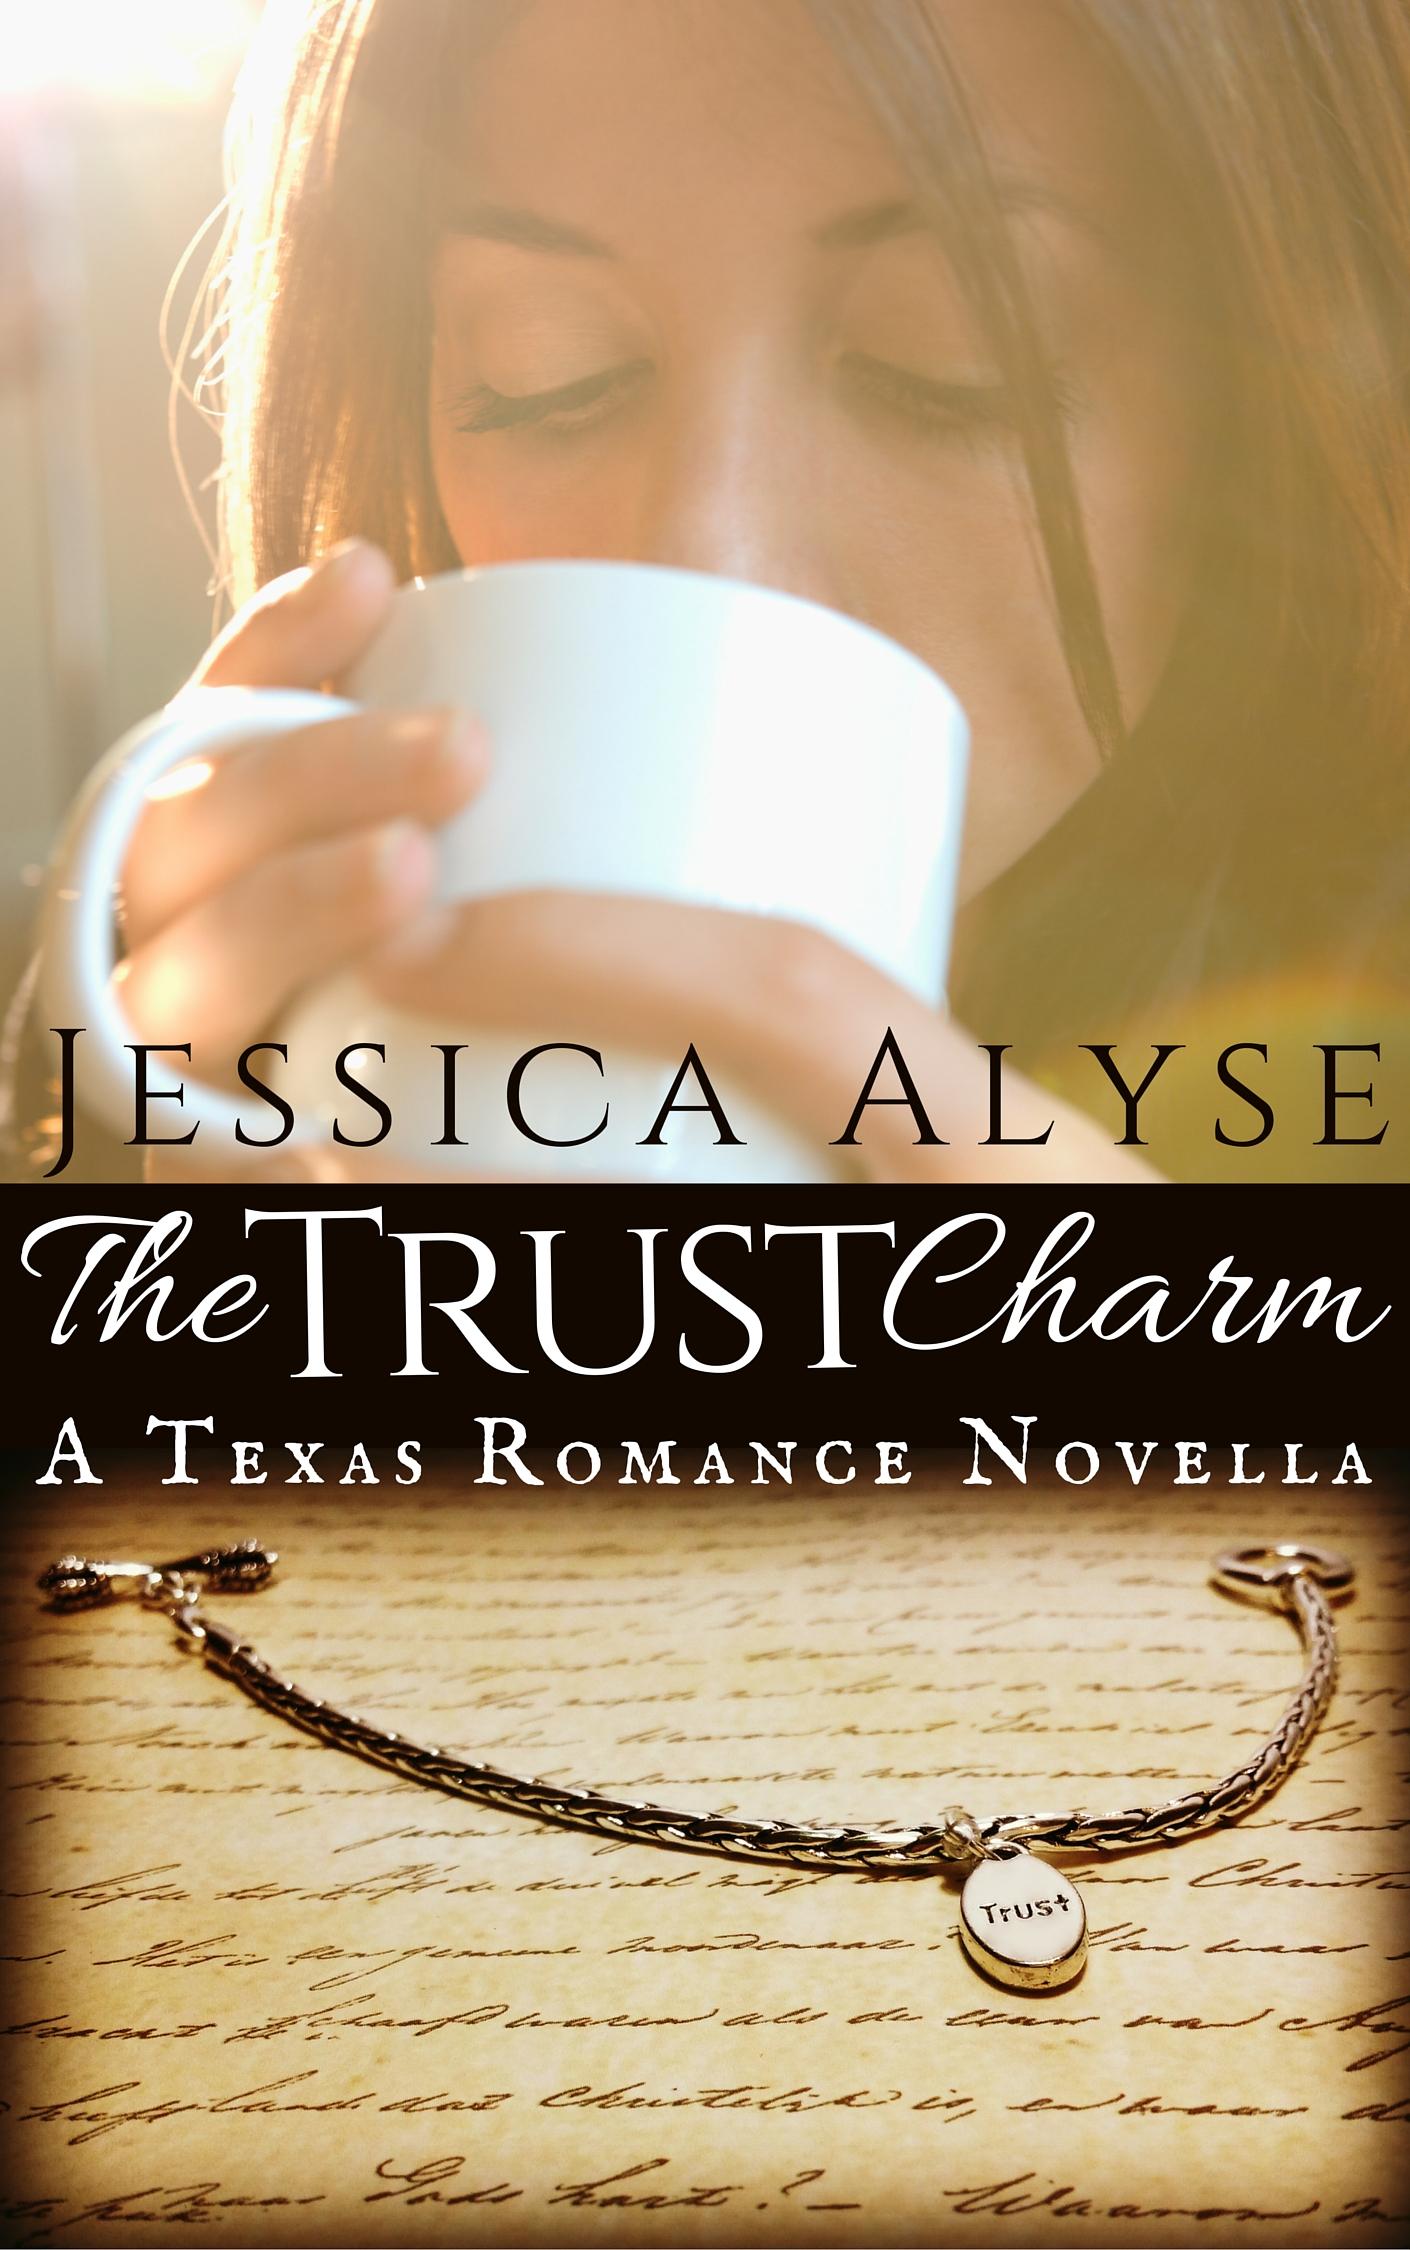 The Trust Charm (2)